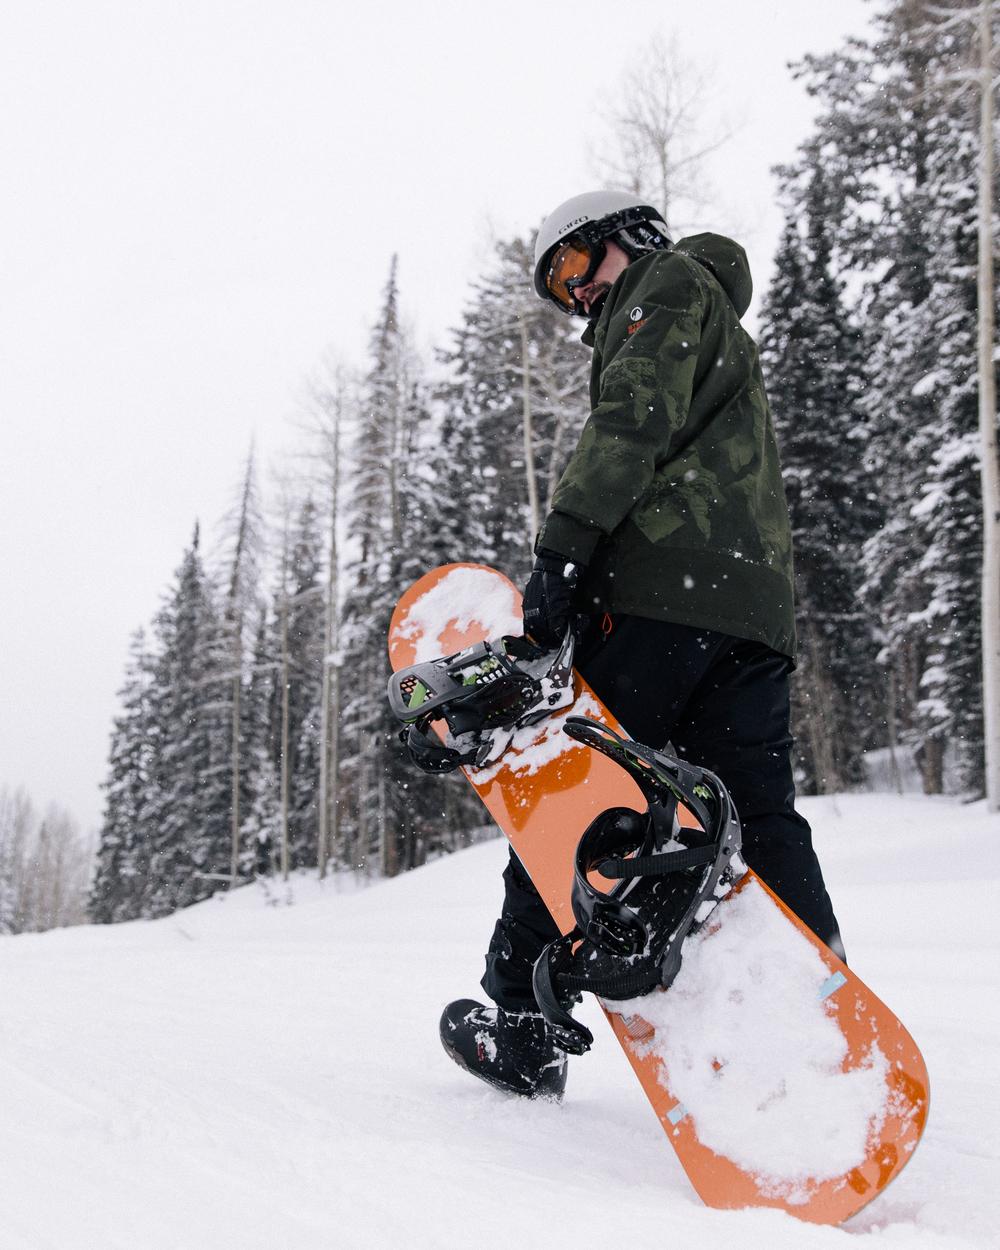 snowboarding70472016.jpg